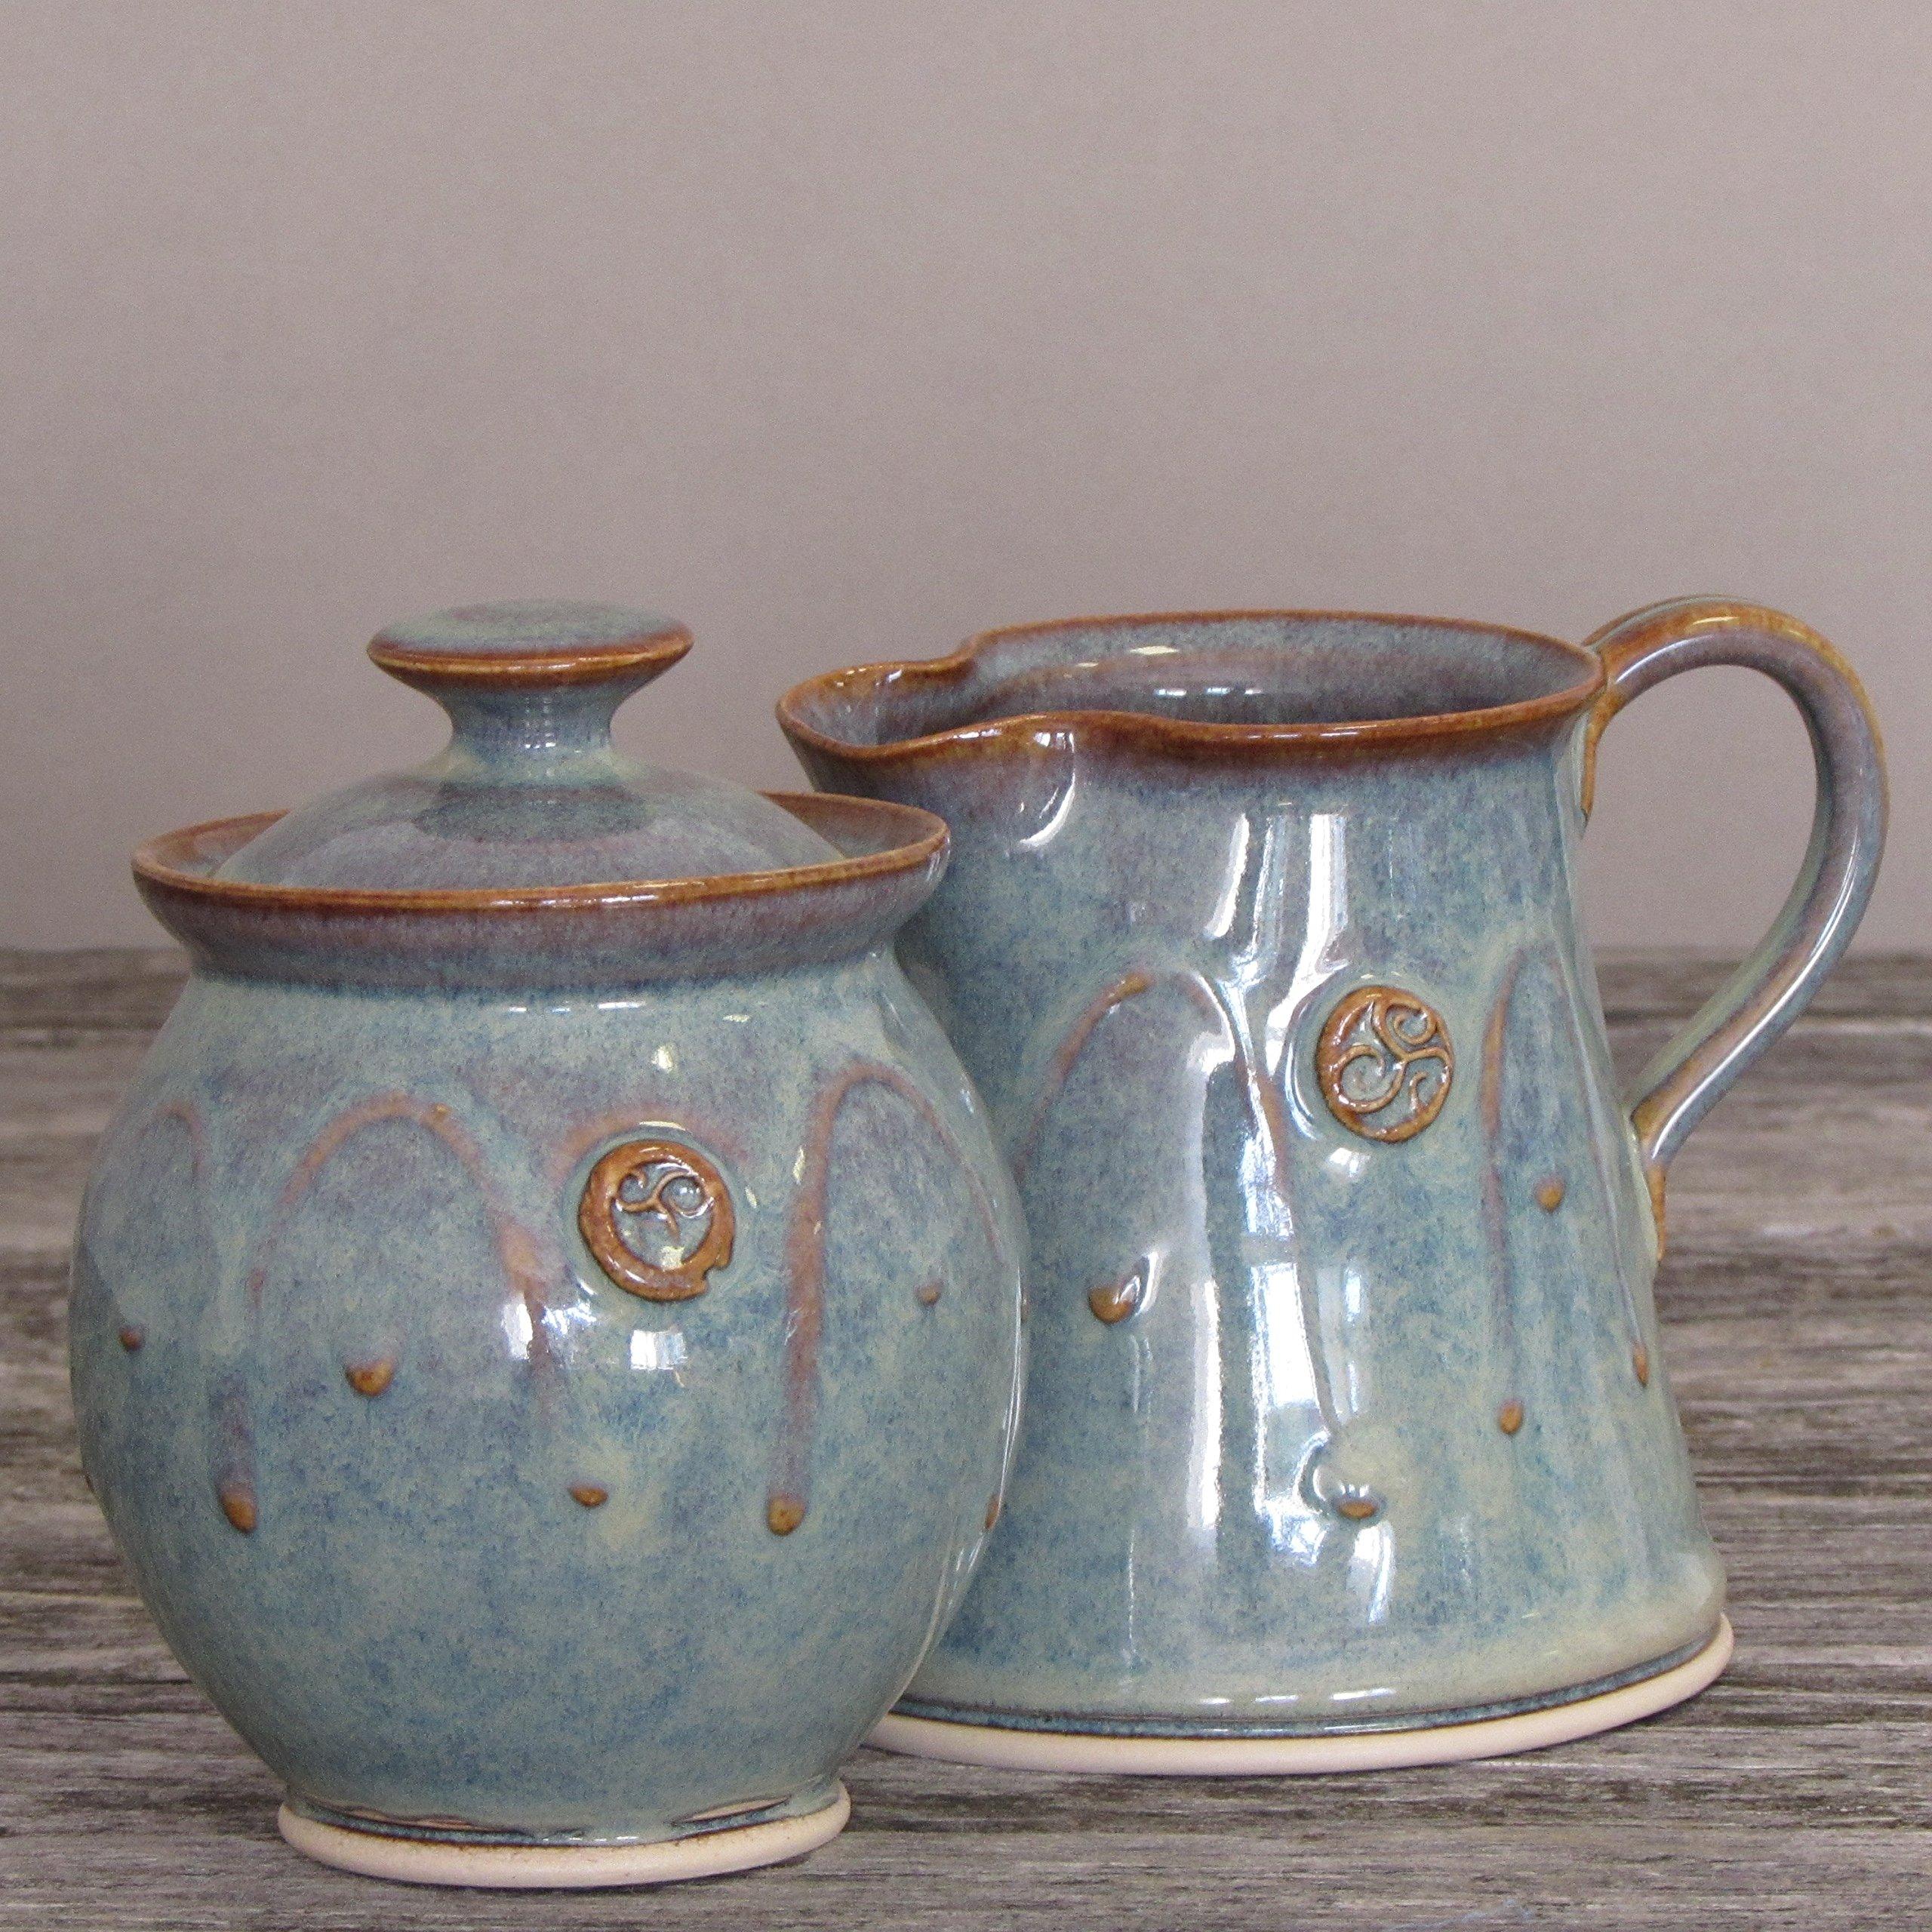 Handmade Irish Pottery Sugar and Creamer Set by Castle Arch Pottery Ireland (Image #3)